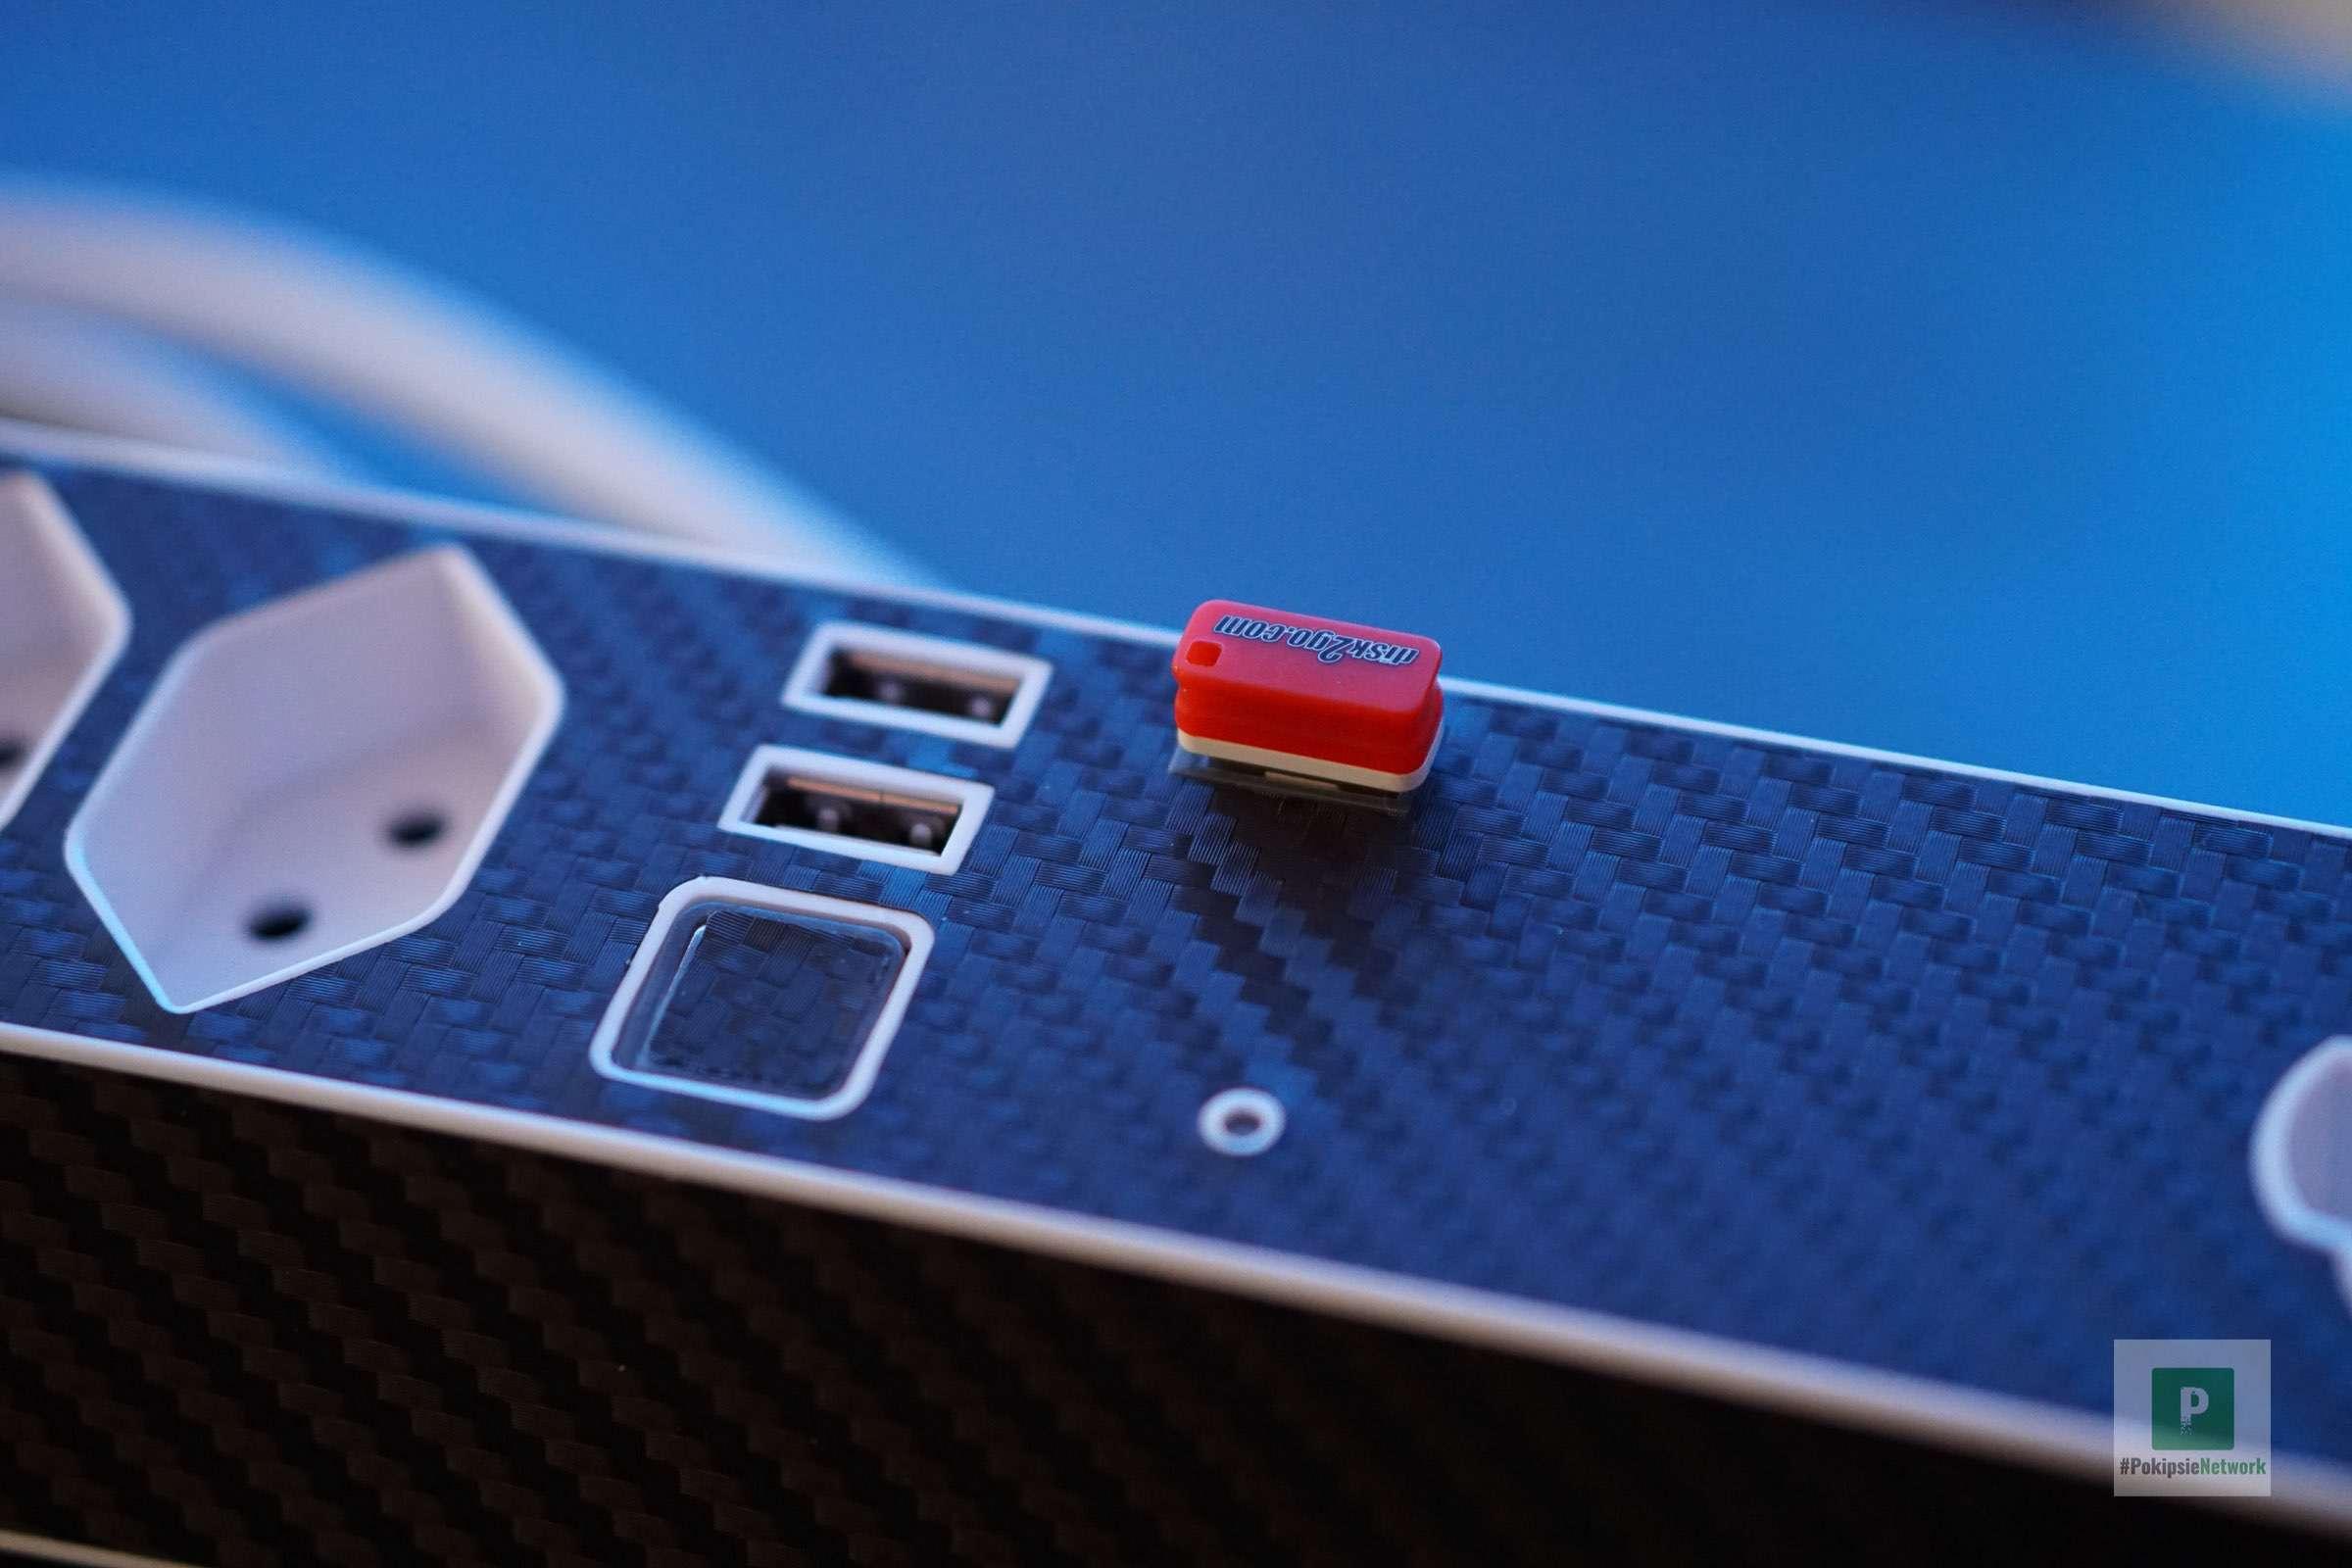 Der integrierte USB-Hub